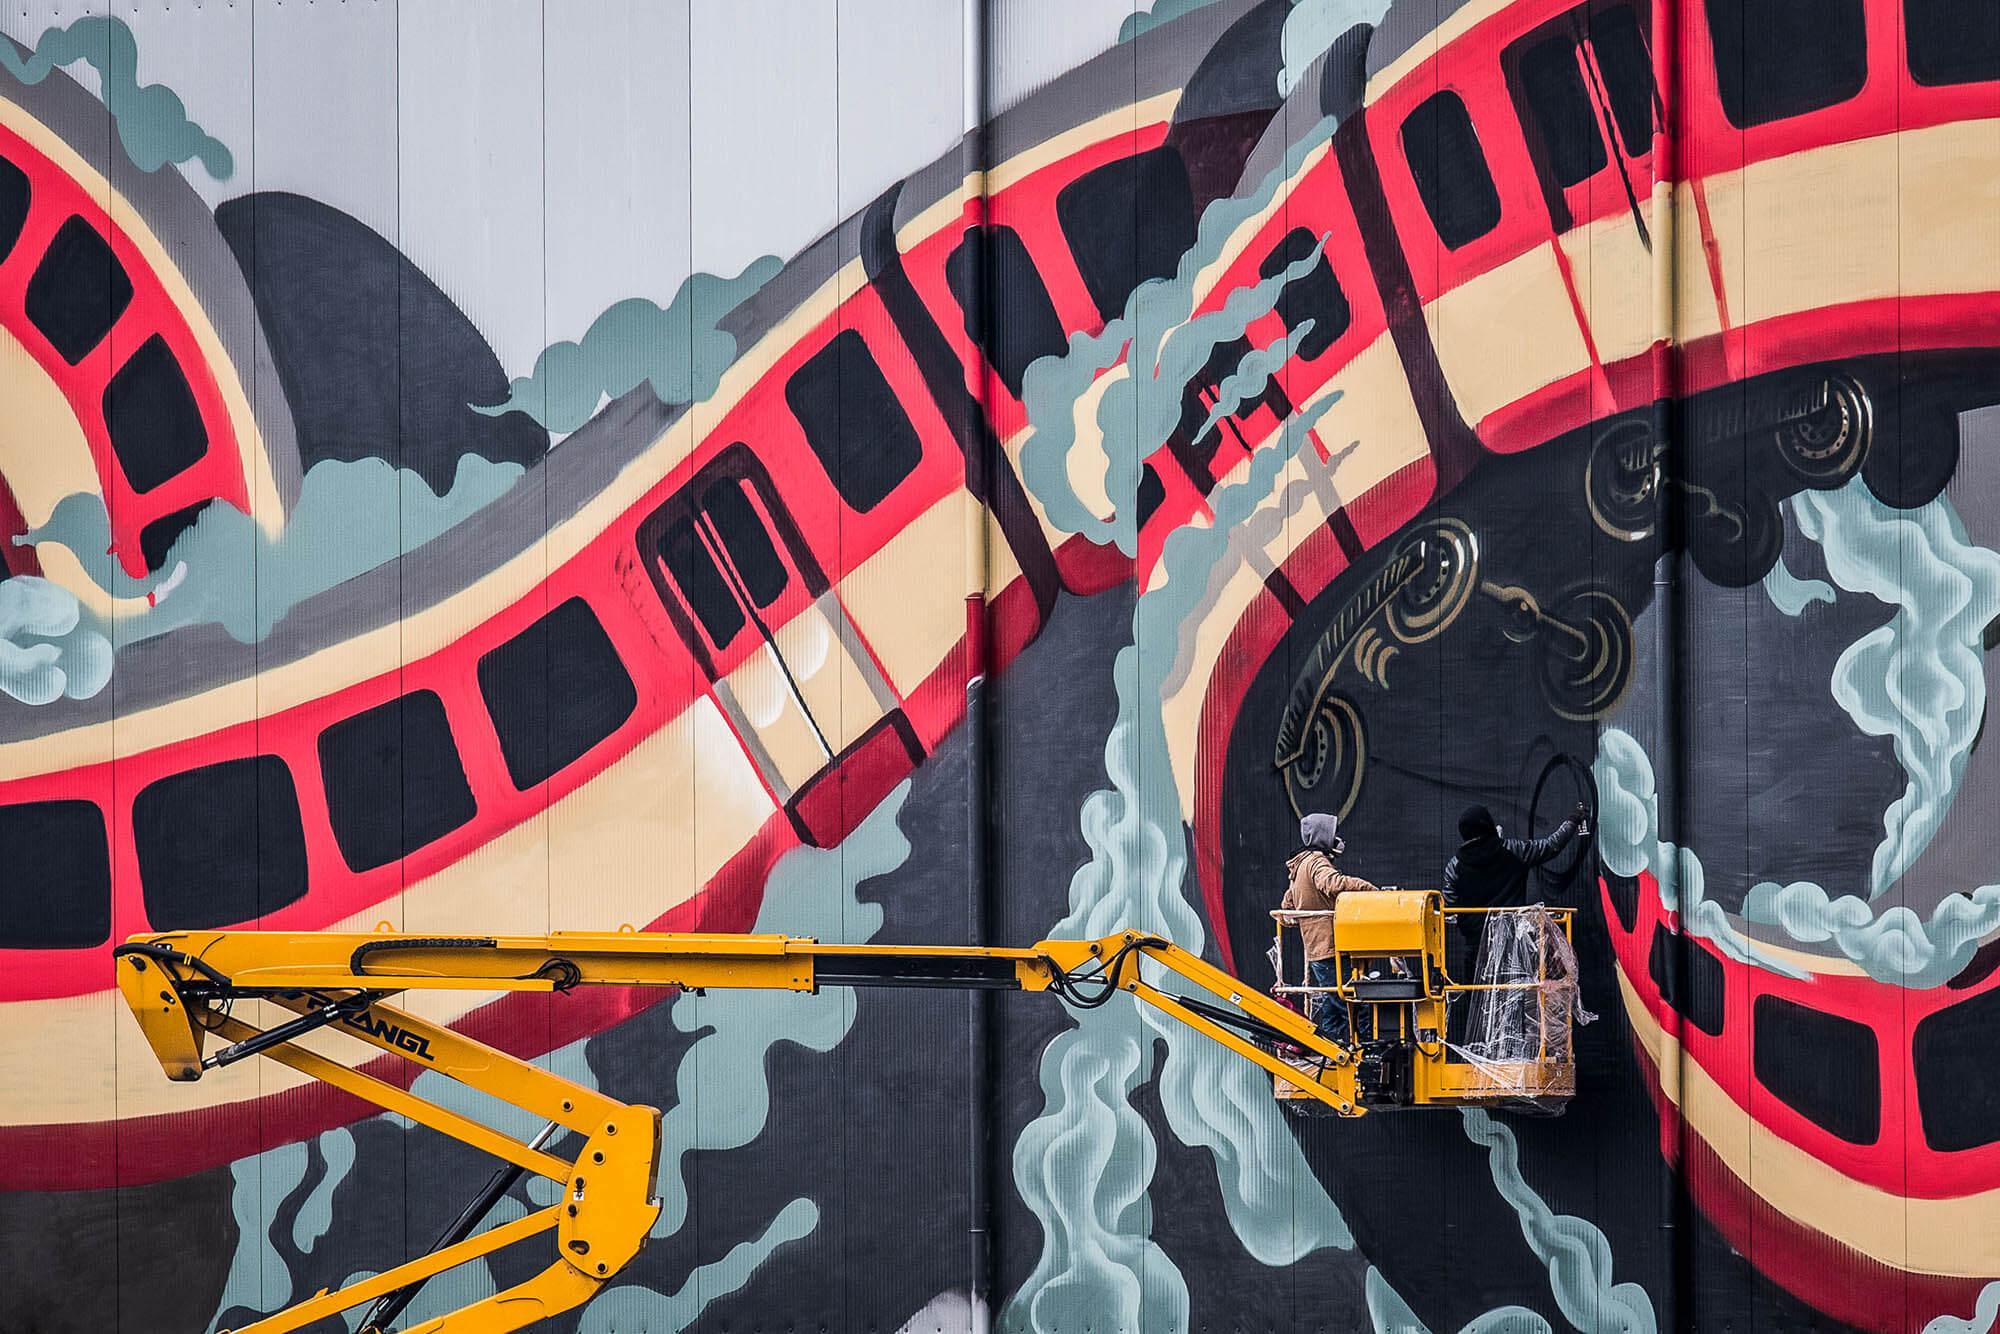 mural harbor graffiti linz the lords crew nychos robotics flap photography fotograf philipp greindl photographer